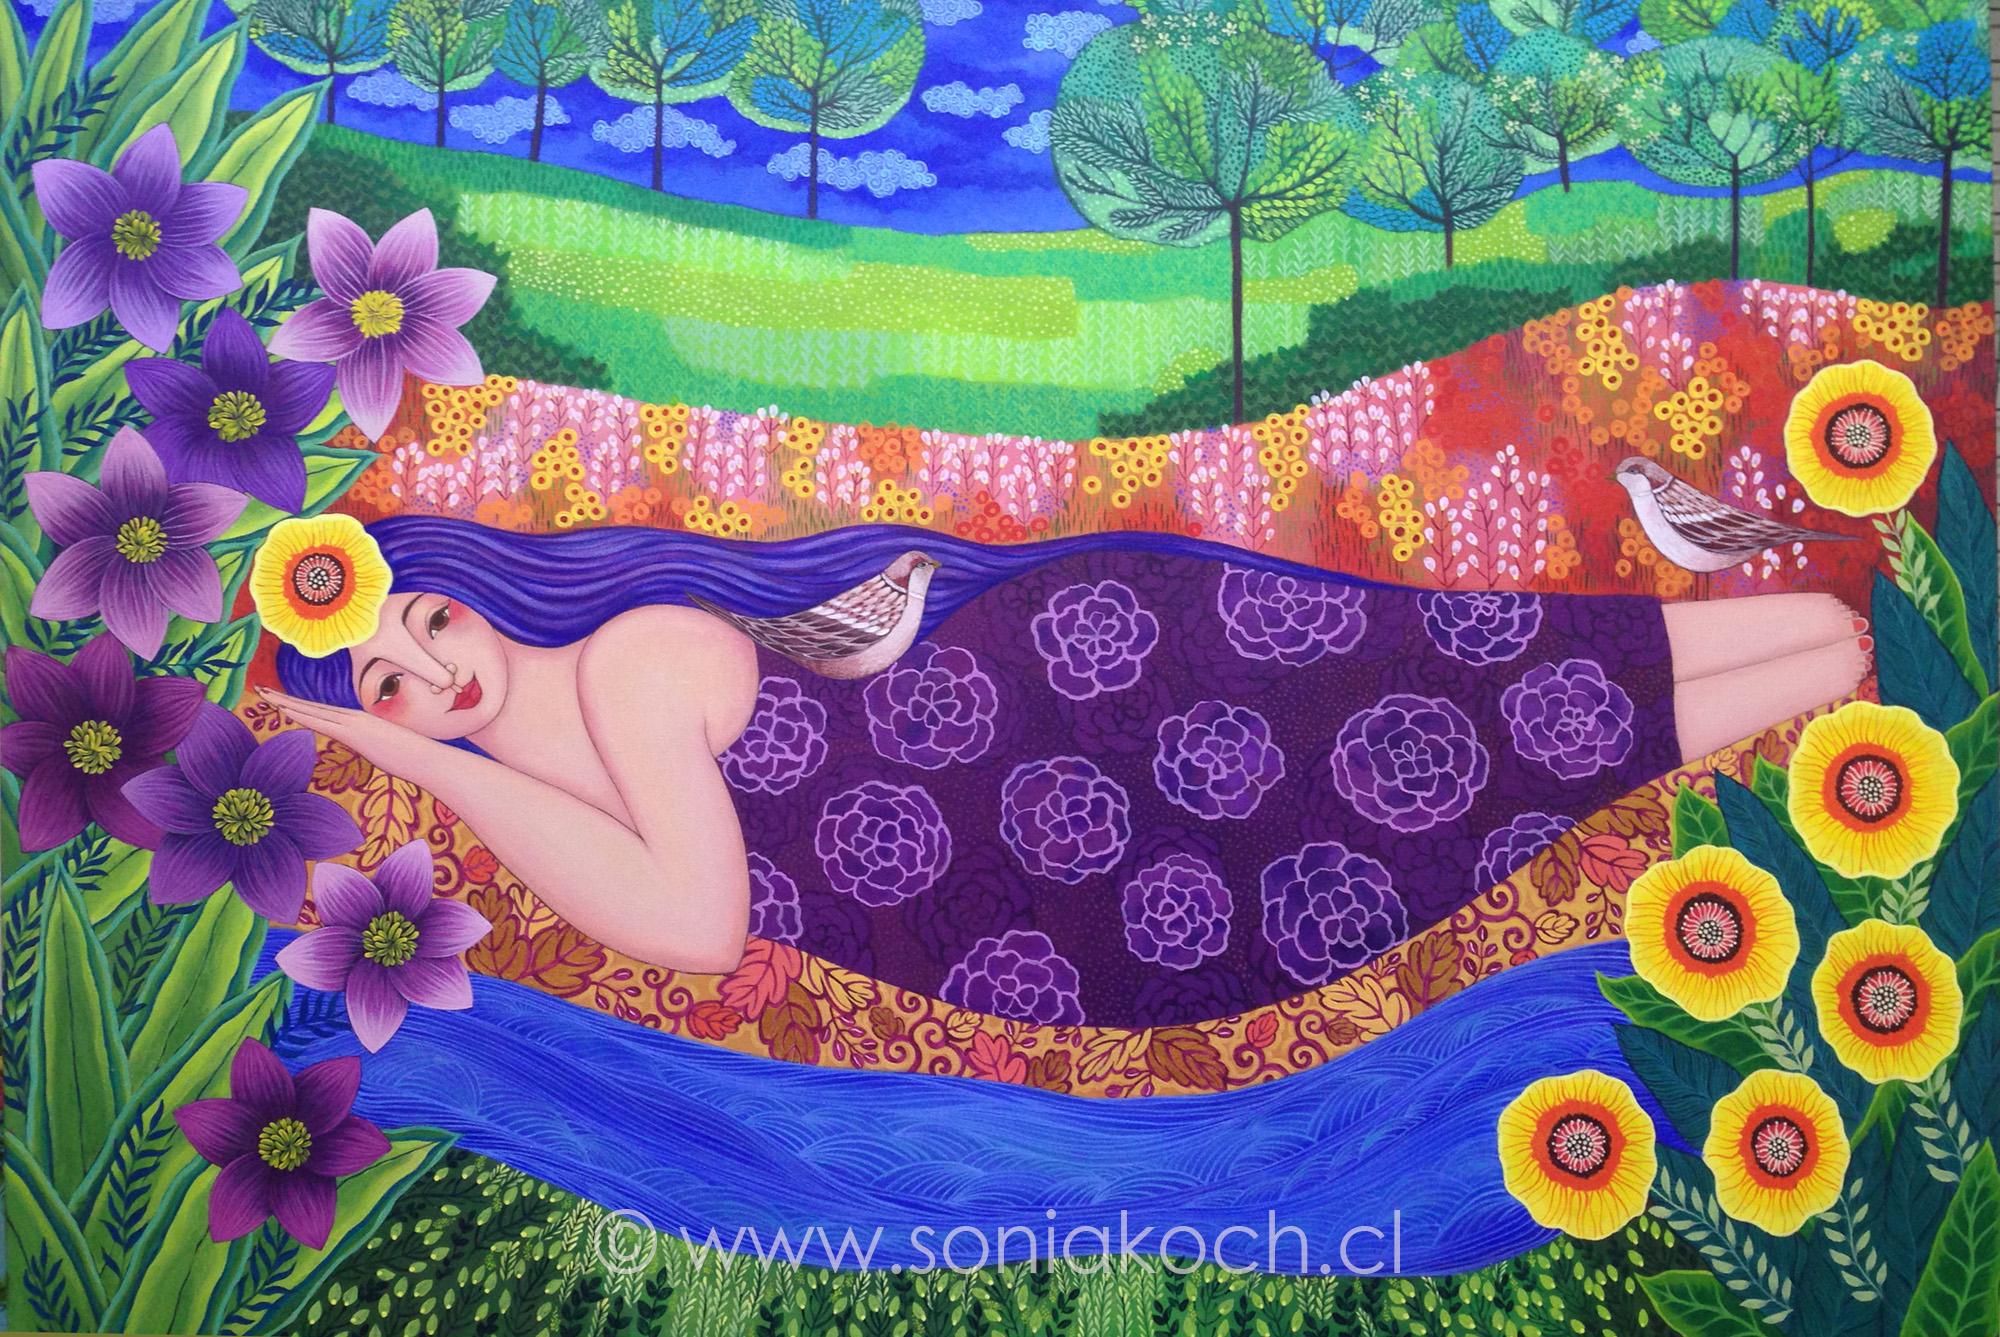 Sacred Garden and Sacred Tree, by Sonia Koch - Tiny Buddha